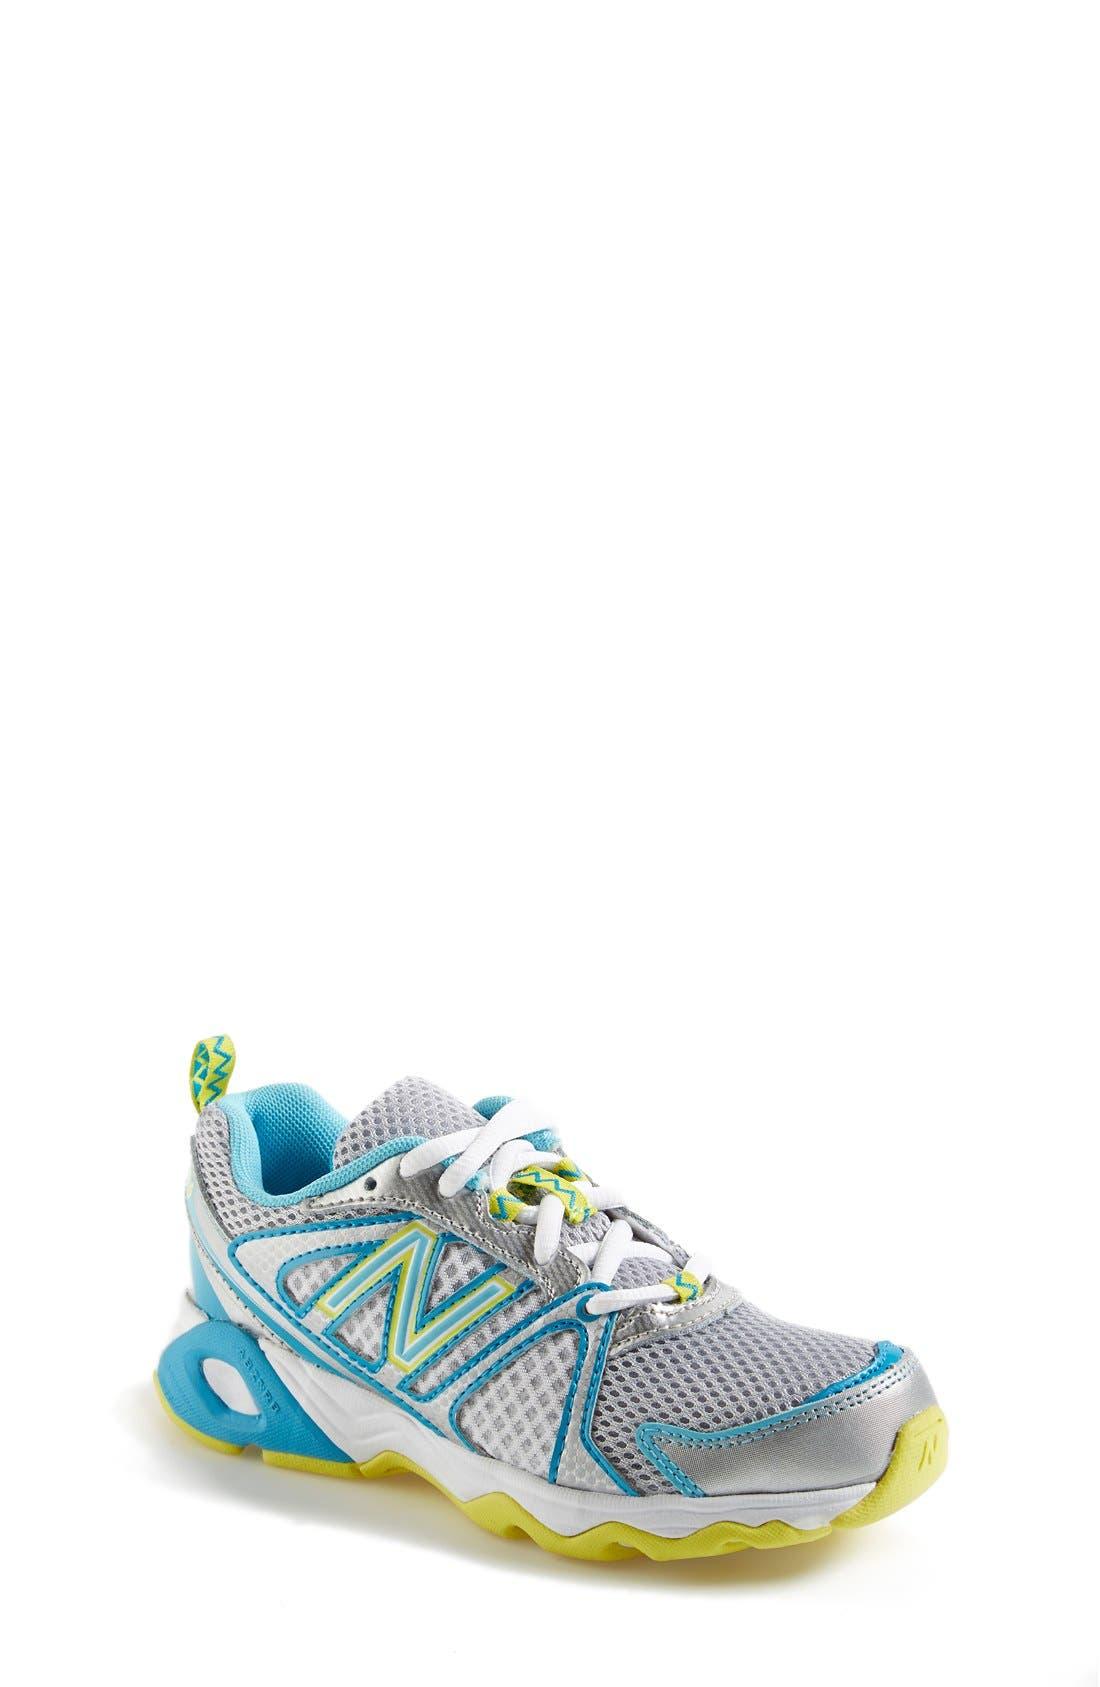 Alternate Image 1 Selected - New Balance '696' Athletic Shoe (Toddler, Little Kid & Big Kid)